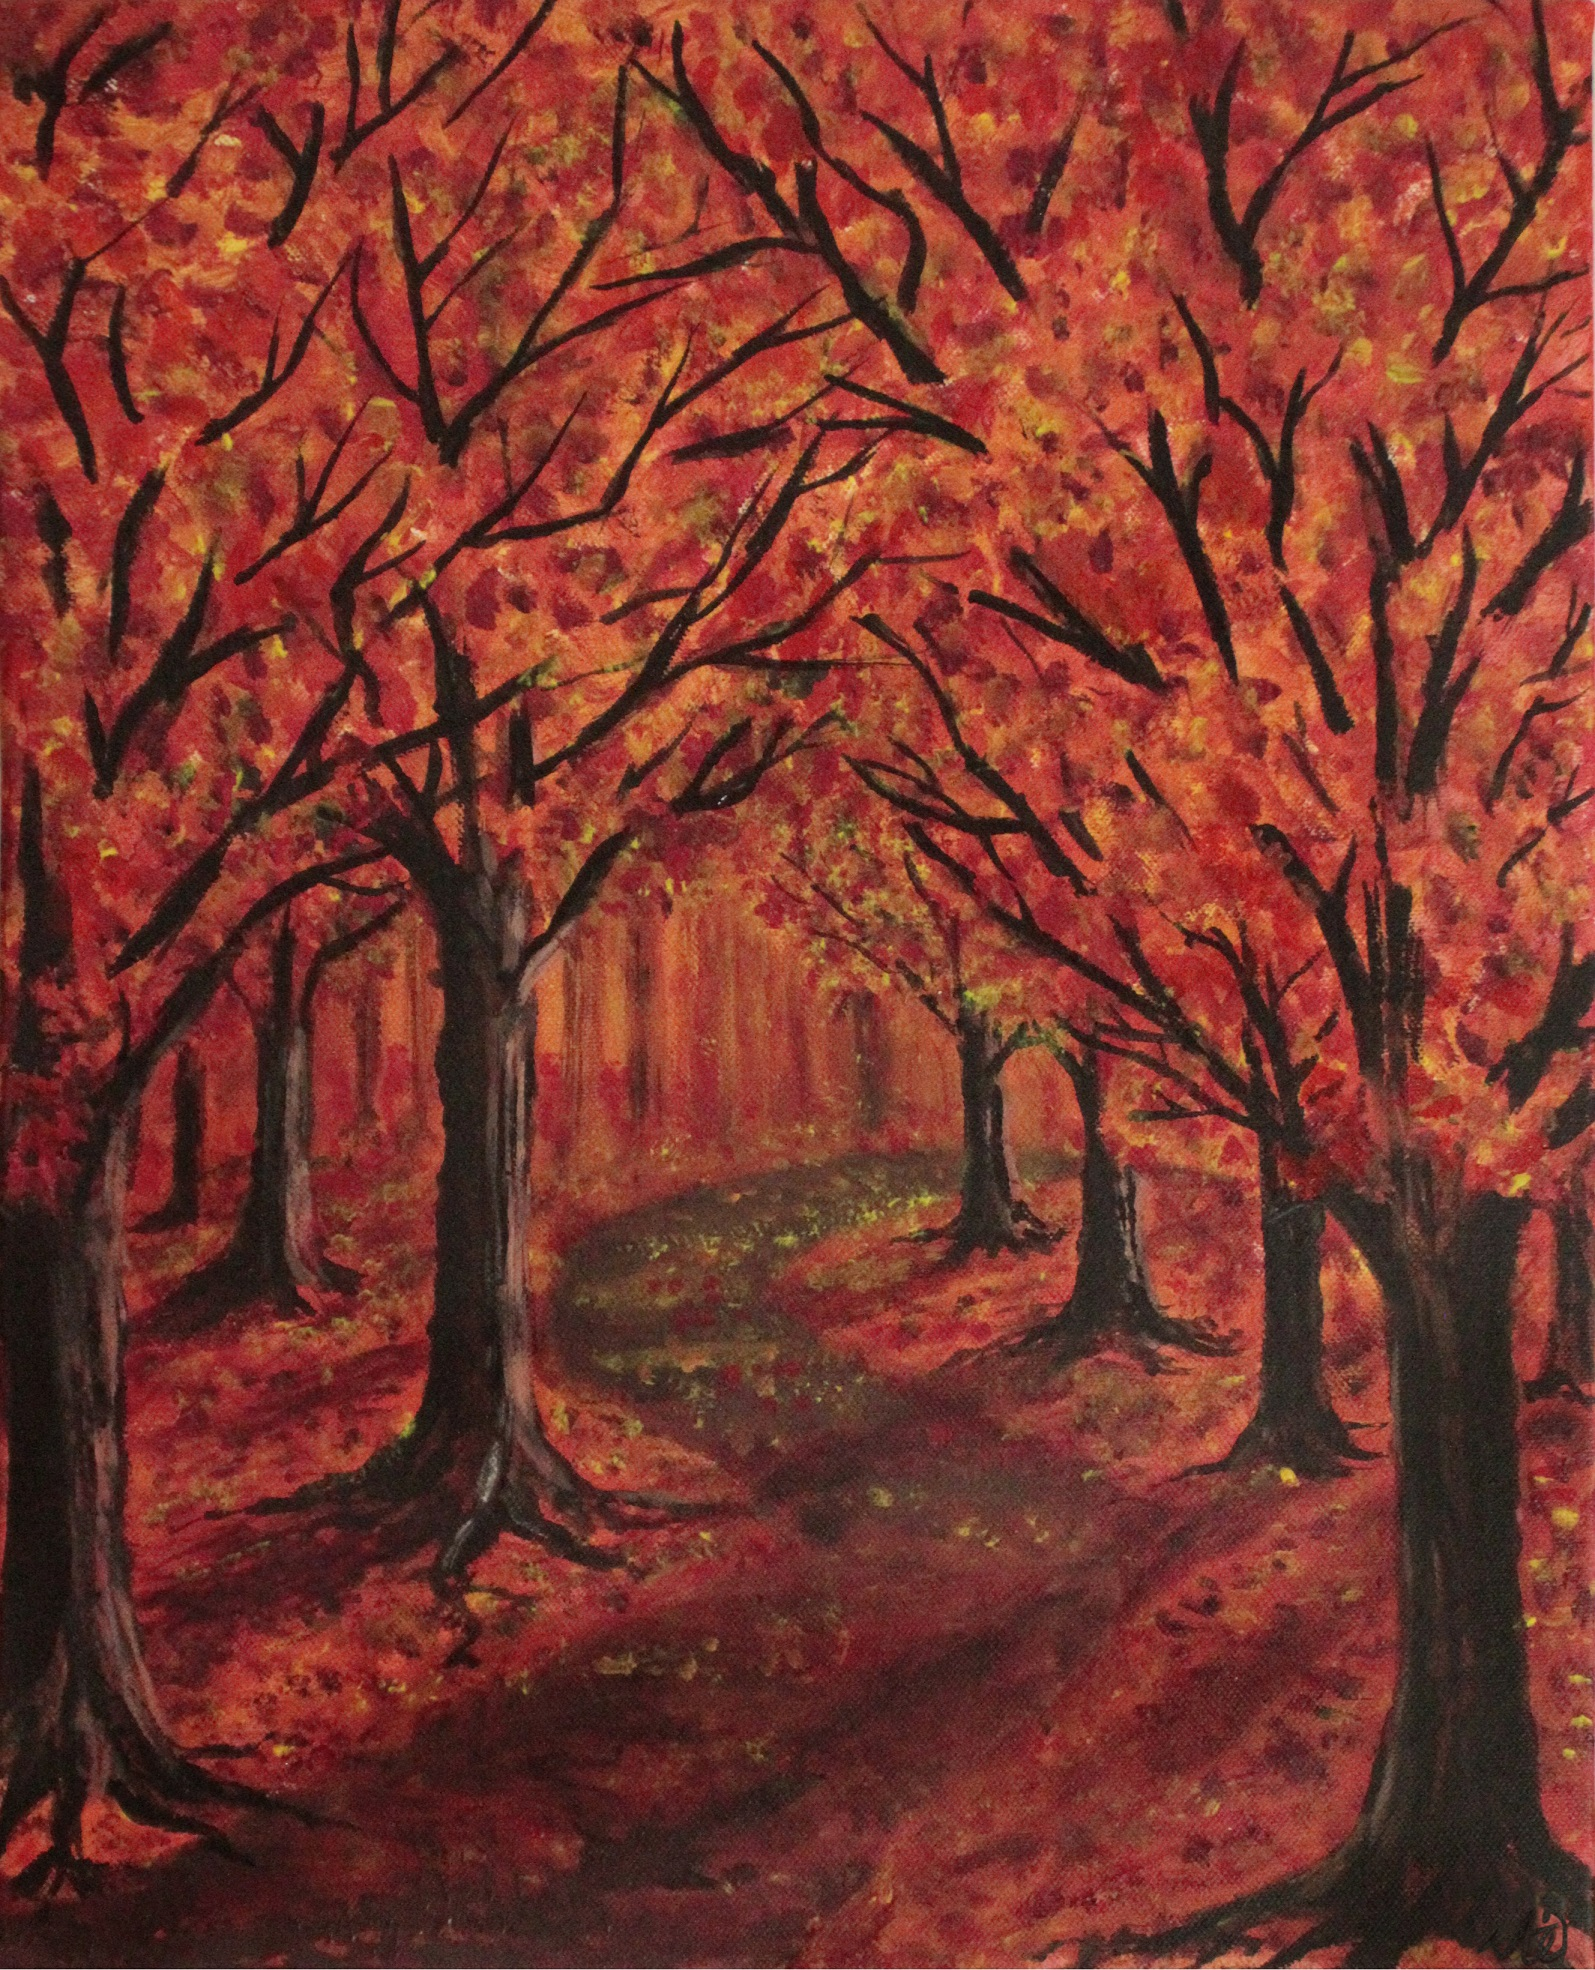 Autumn Impressions artwork by  Derkestai - art listed for sale on Artplode